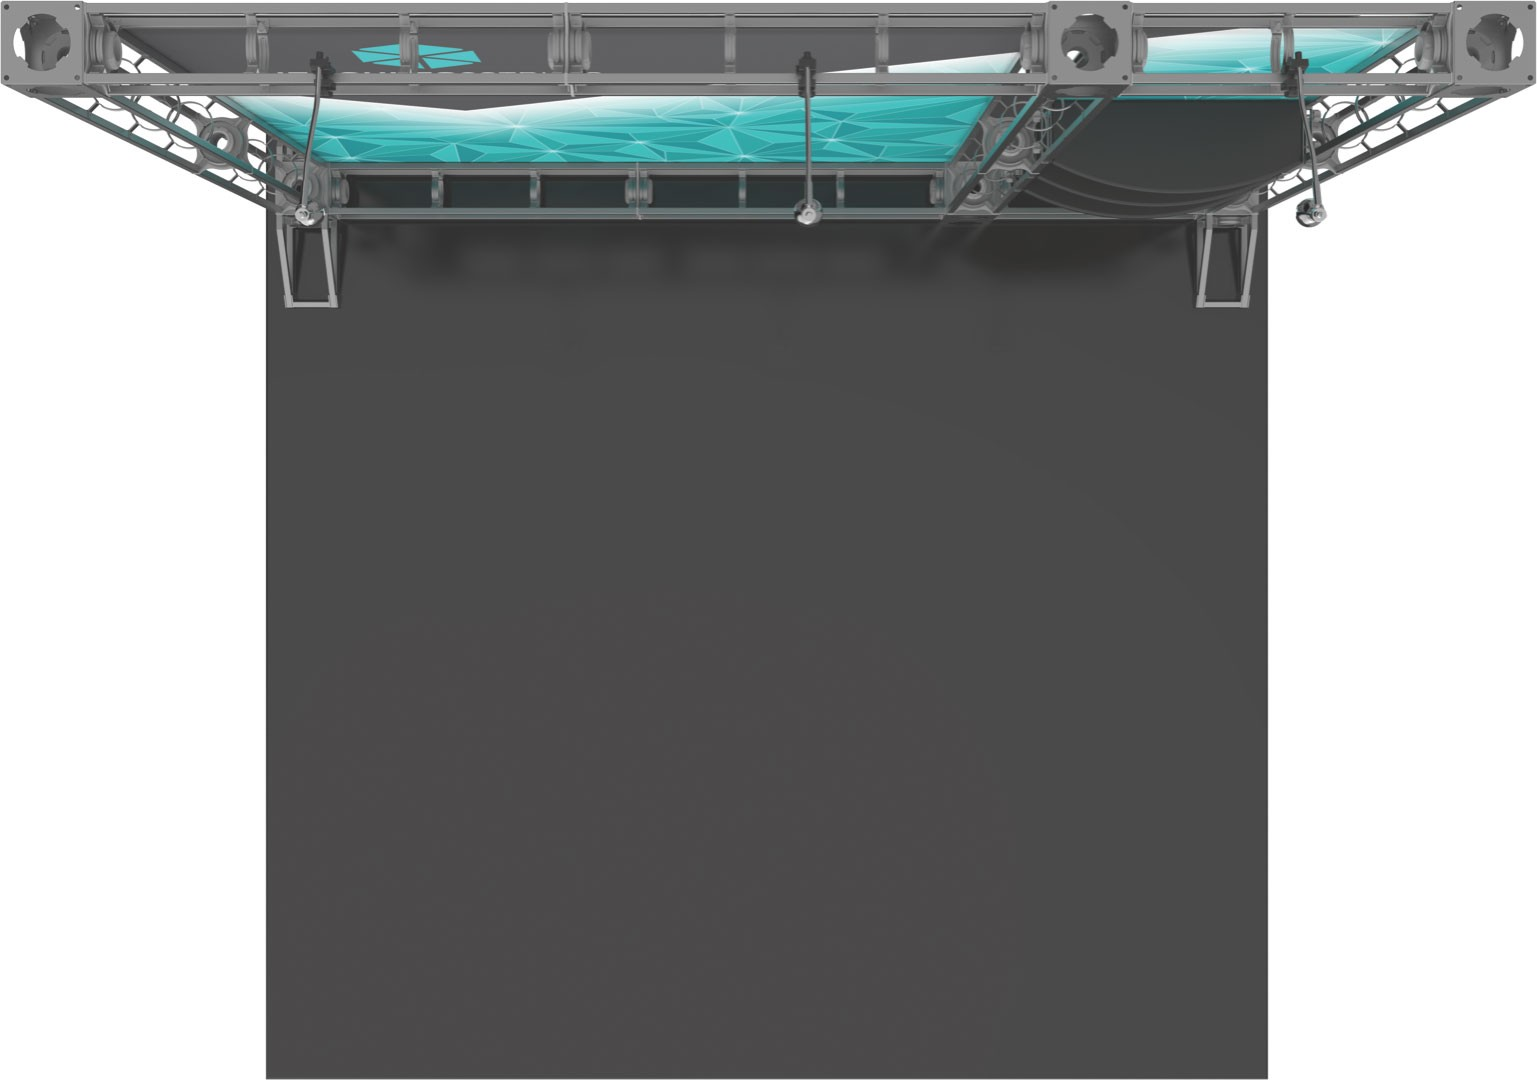 Hercules 10x10 Orbital Express Truss Kit 8